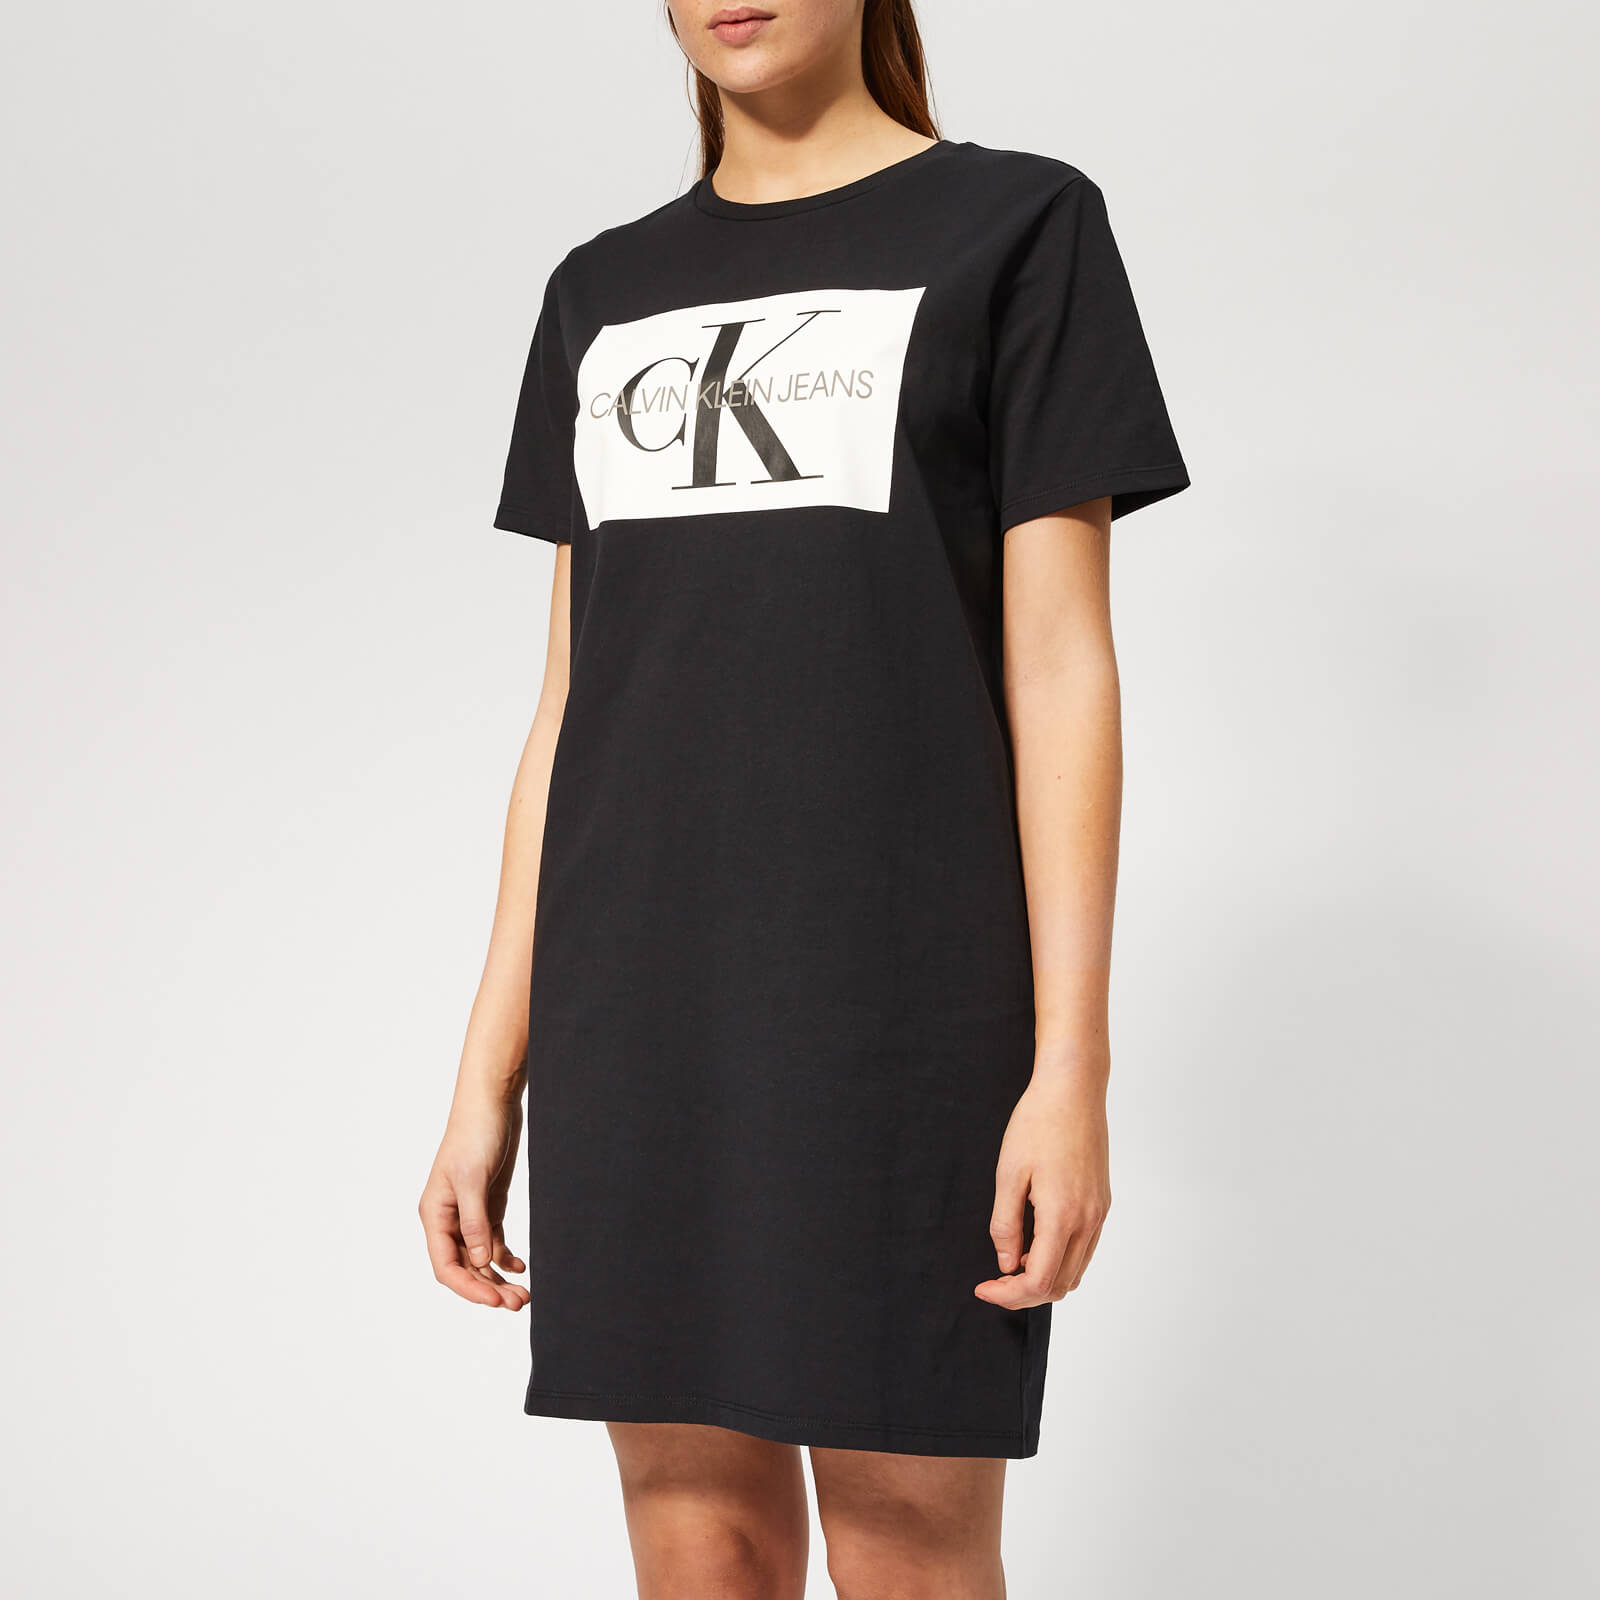 0c71d4b95213d7 Calvin Klein Jeans Women s Iconic Monogram Box T-Shirt Dress - CK Black  Womens Clothing